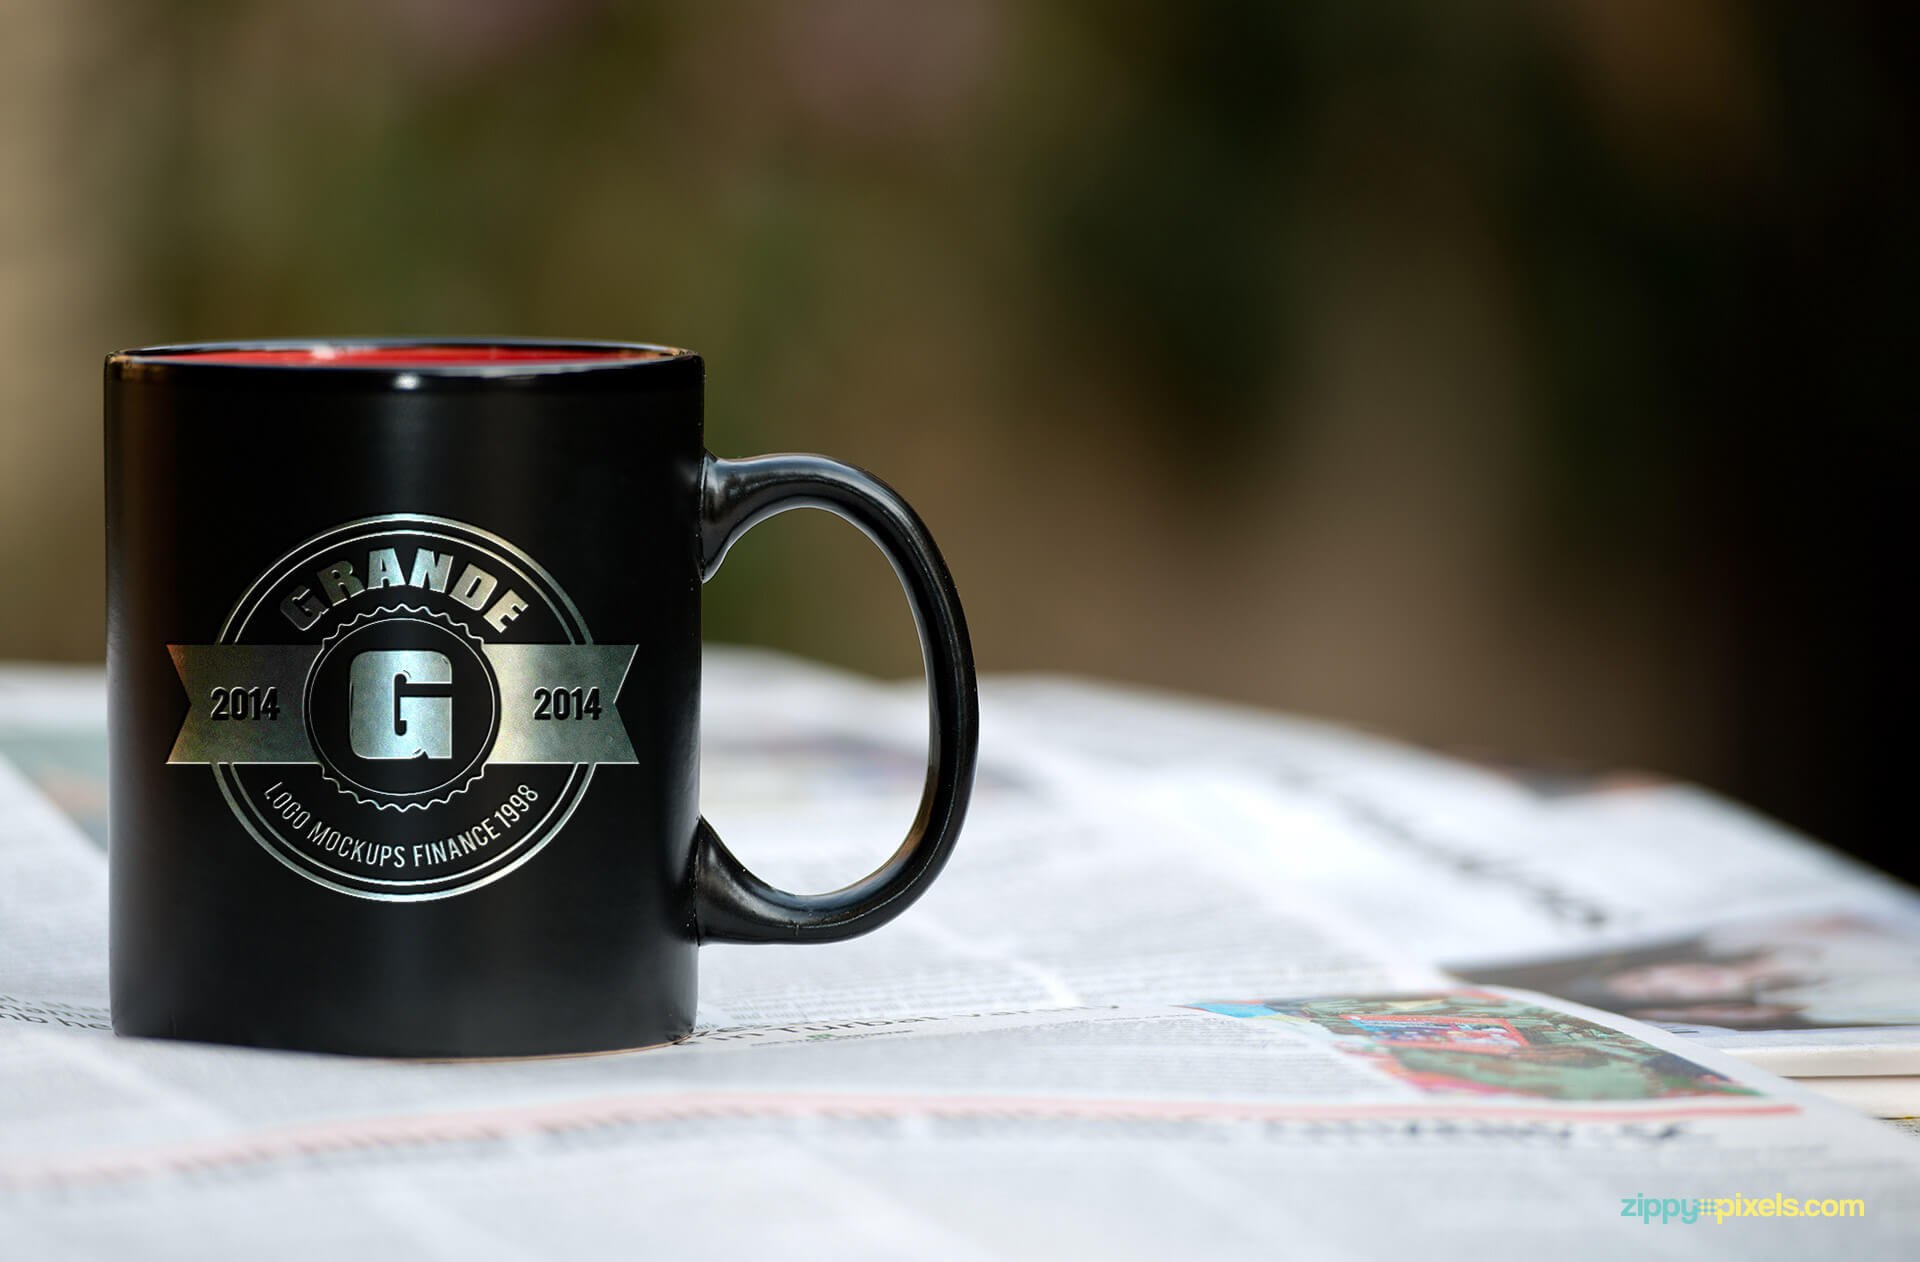 Brand Identity Mockup of a Black Mug